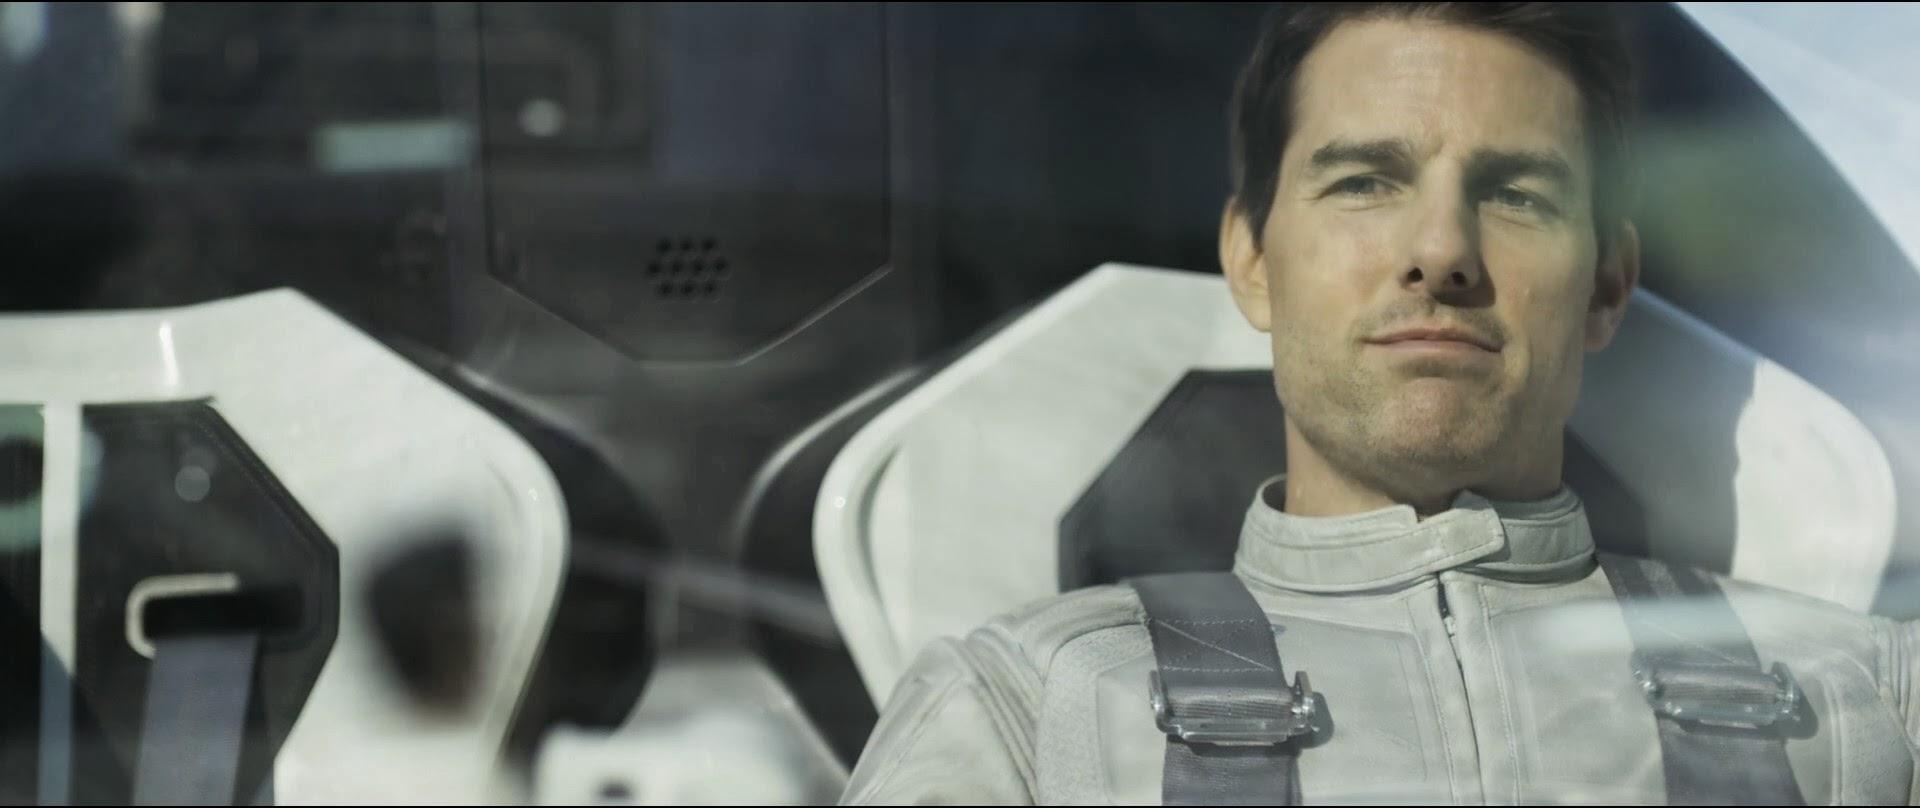 Oblivion (2013) BluRay 1080p 5.1CH x264 Ganool_0001